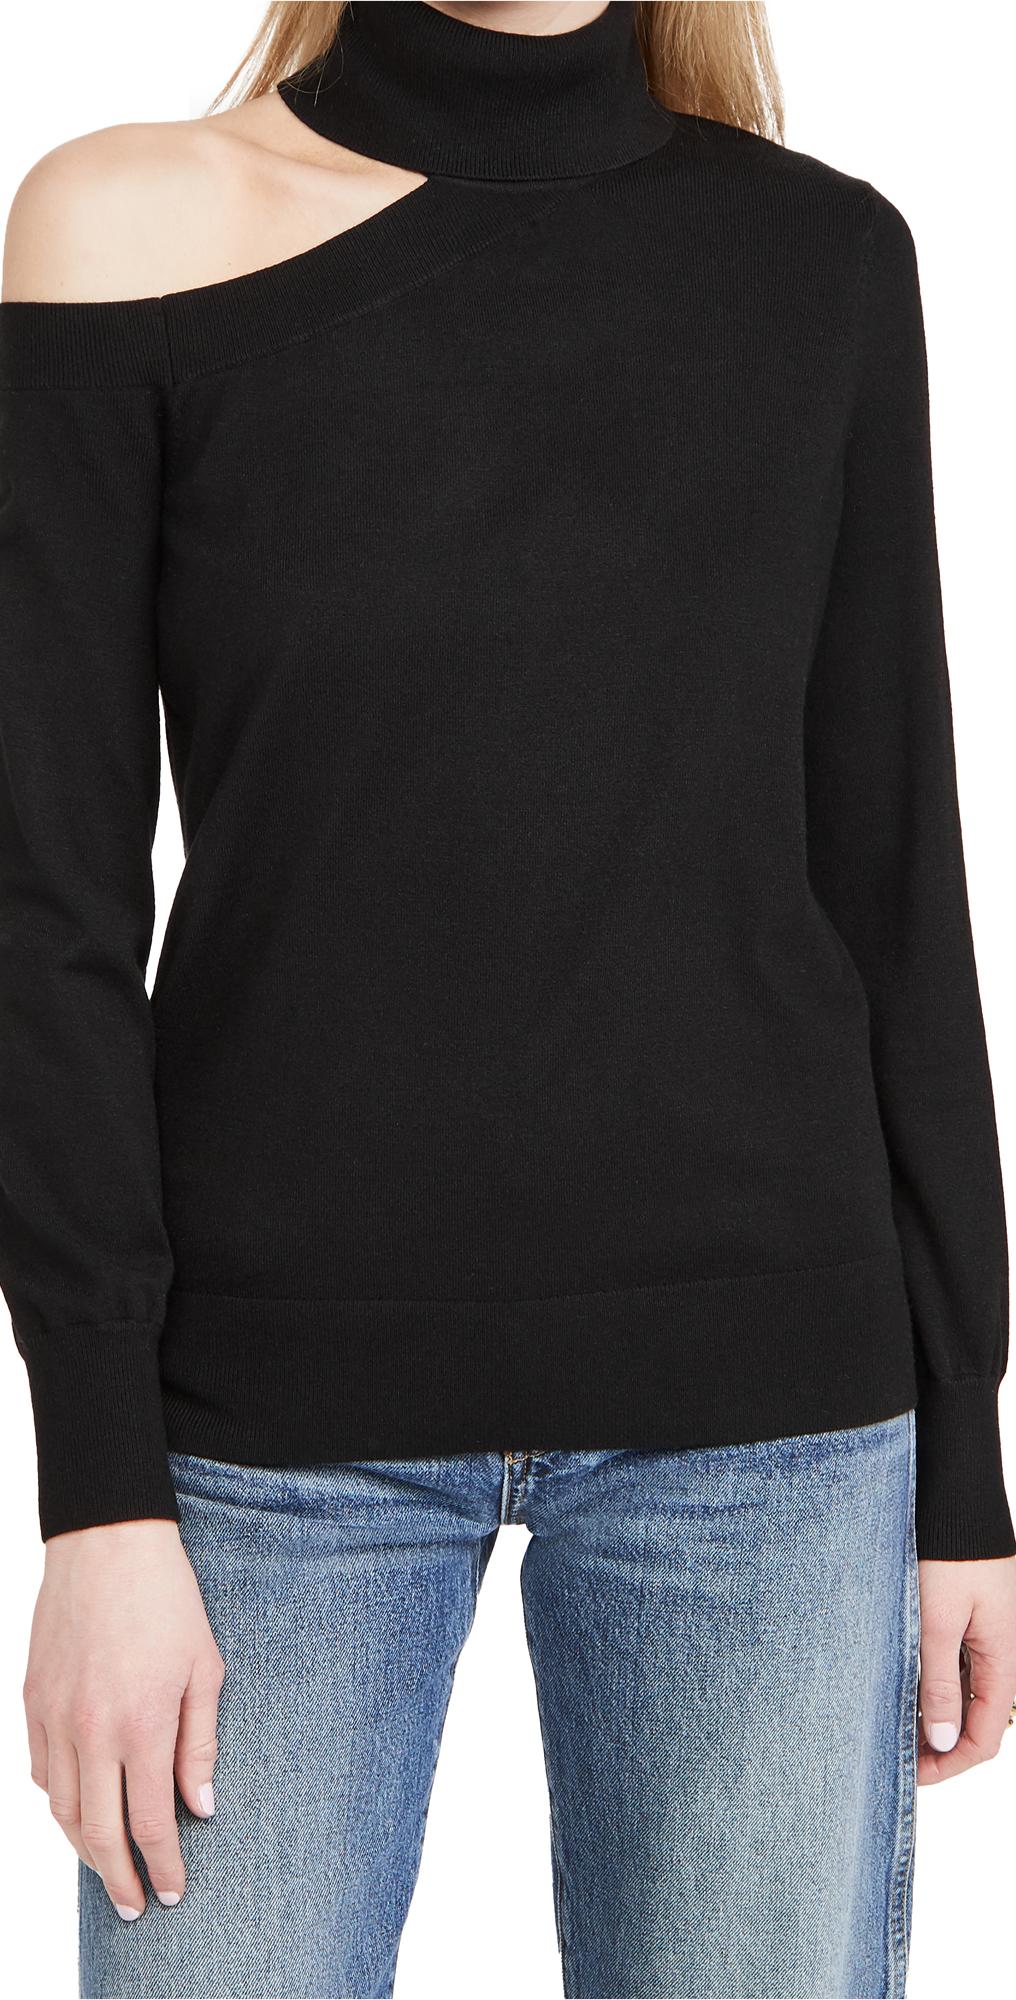 L'AGENCE Easton One Shoulder Sweater